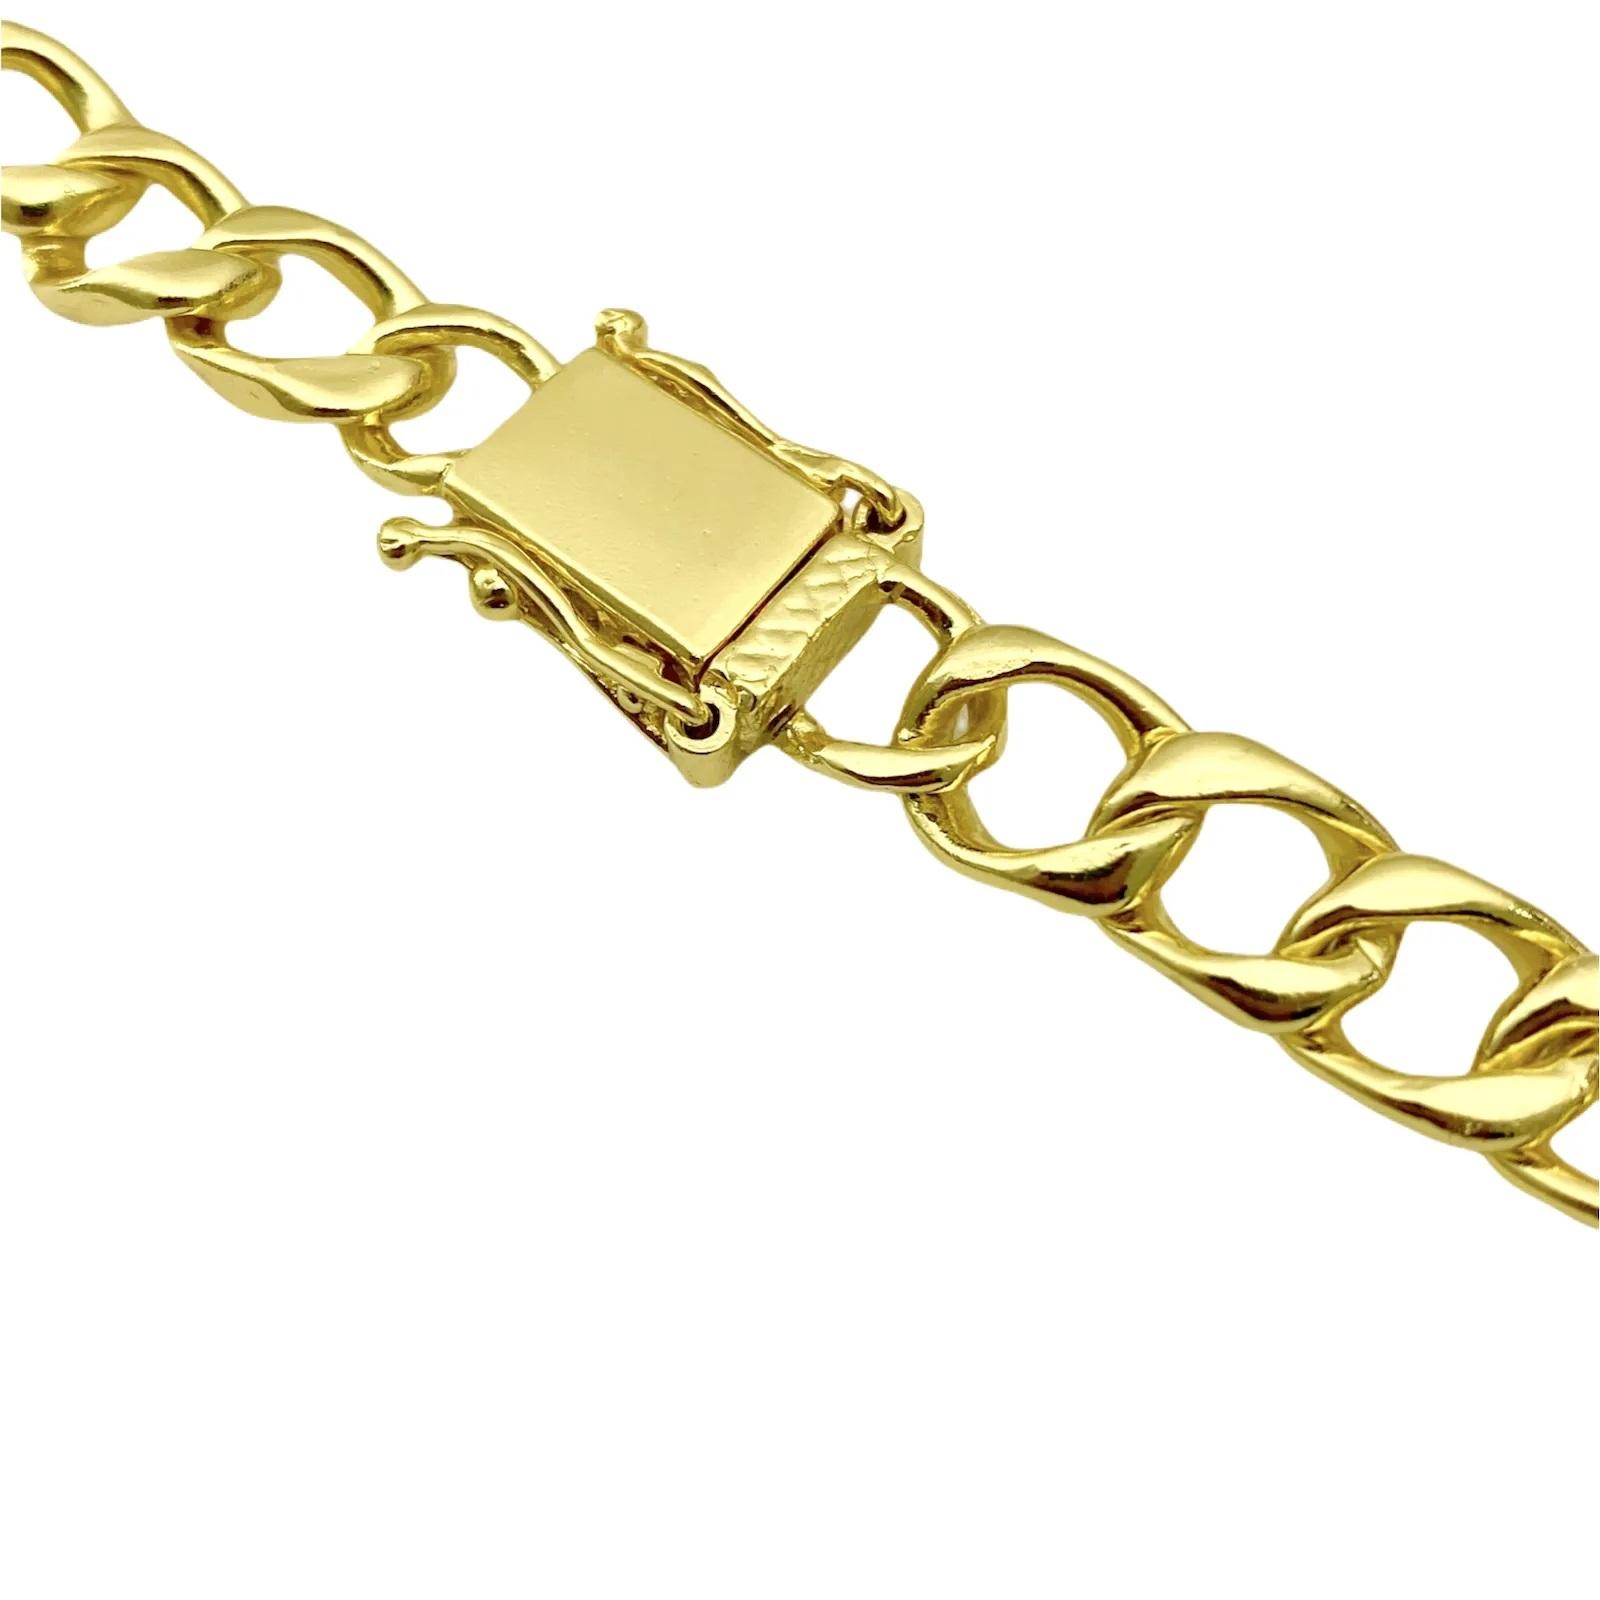 Corrente Grumet 7,5mm 70cm 40g (Fecho Gaveta Duplo) (Banho Ouro 24k)